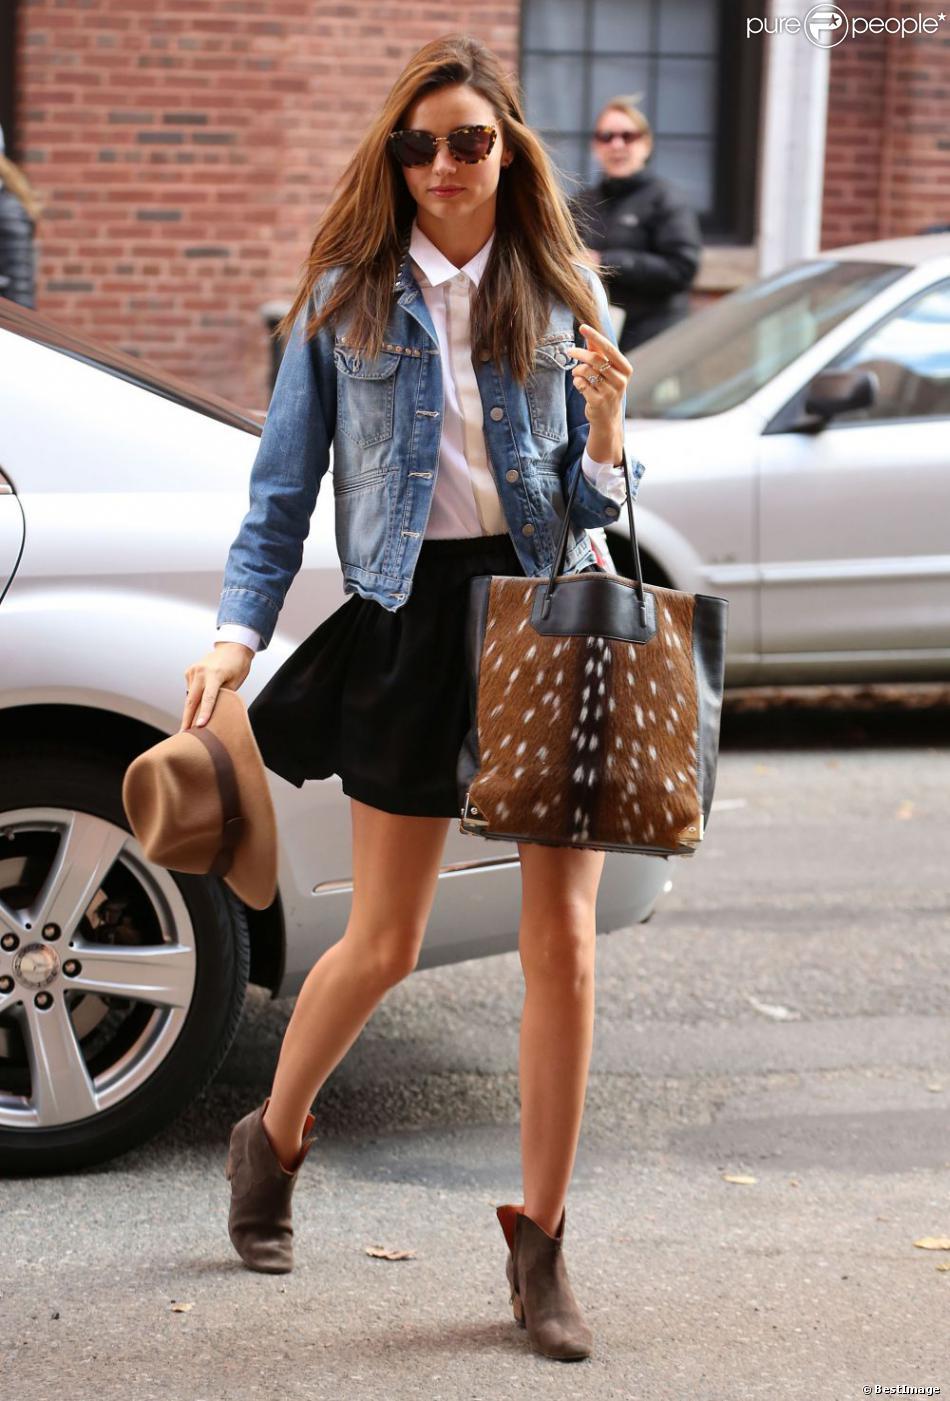 miranda kerr new york porte une veste en jean et des bottines isabel marant un sac alexander. Black Bedroom Furniture Sets. Home Design Ideas